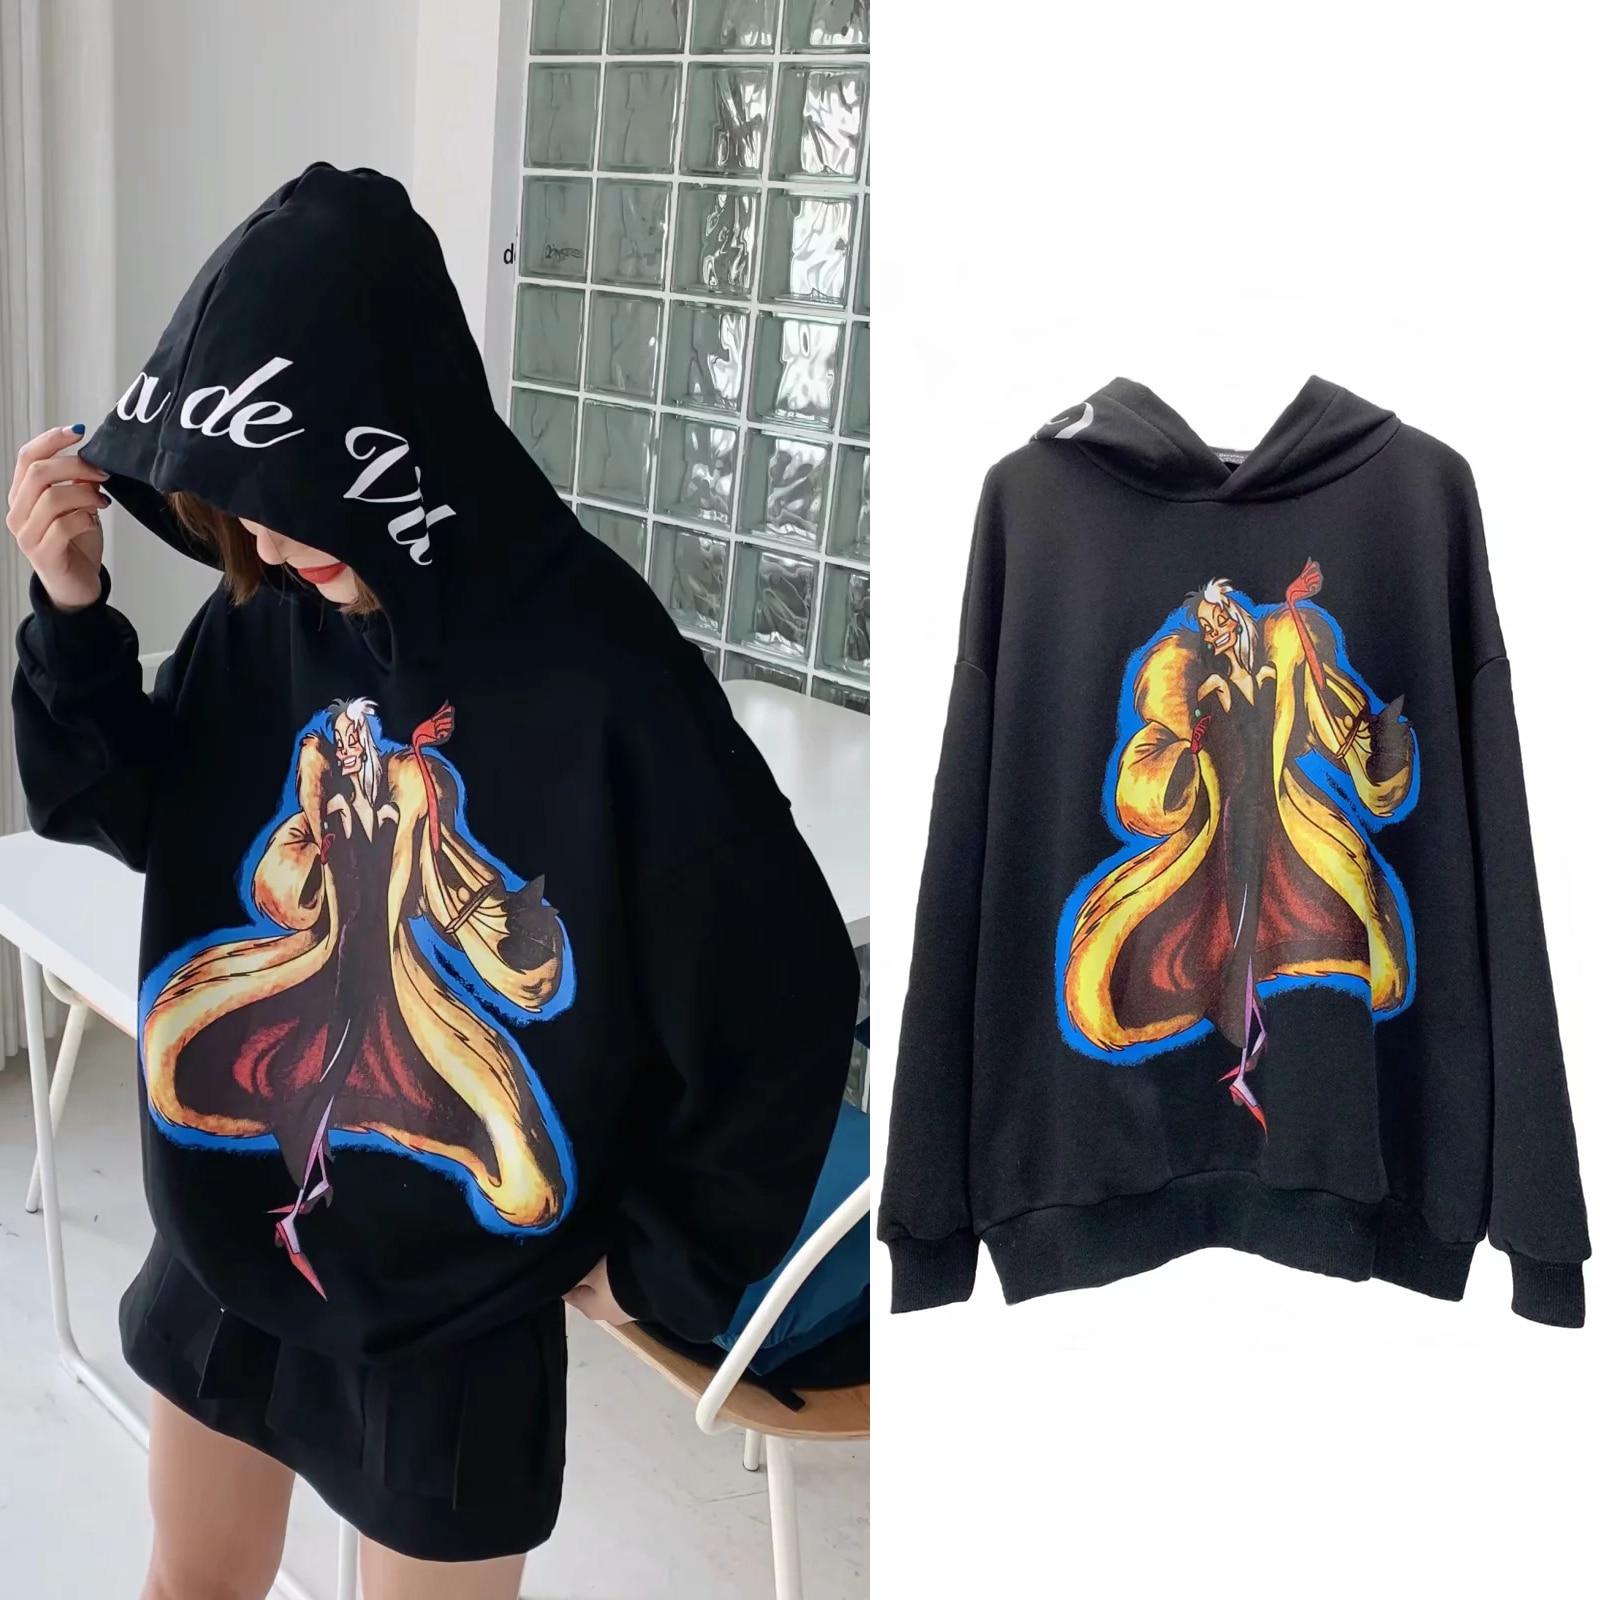 Hoodies With Cartoon Characters Sweatshirt Women Clothing Pullover Streetwear Print 2019 O Neck Long Sleeve Sweatshirts